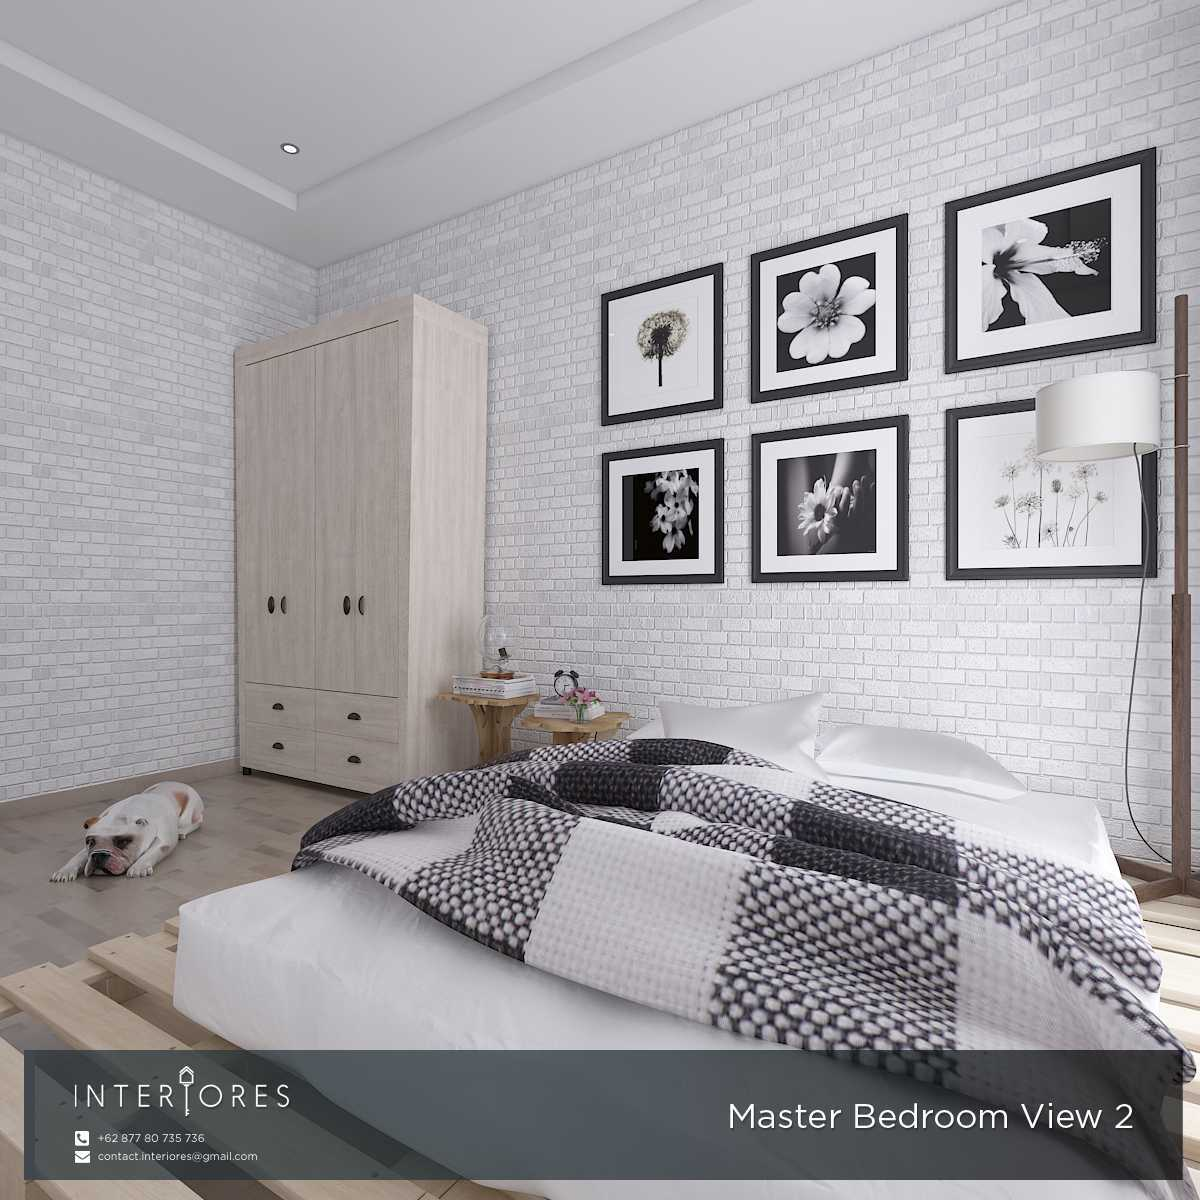 Interiores Interior Consultant & Build P. Scandi Pejaten Pejaten Master Bedroom Modern,skandinavia 17957